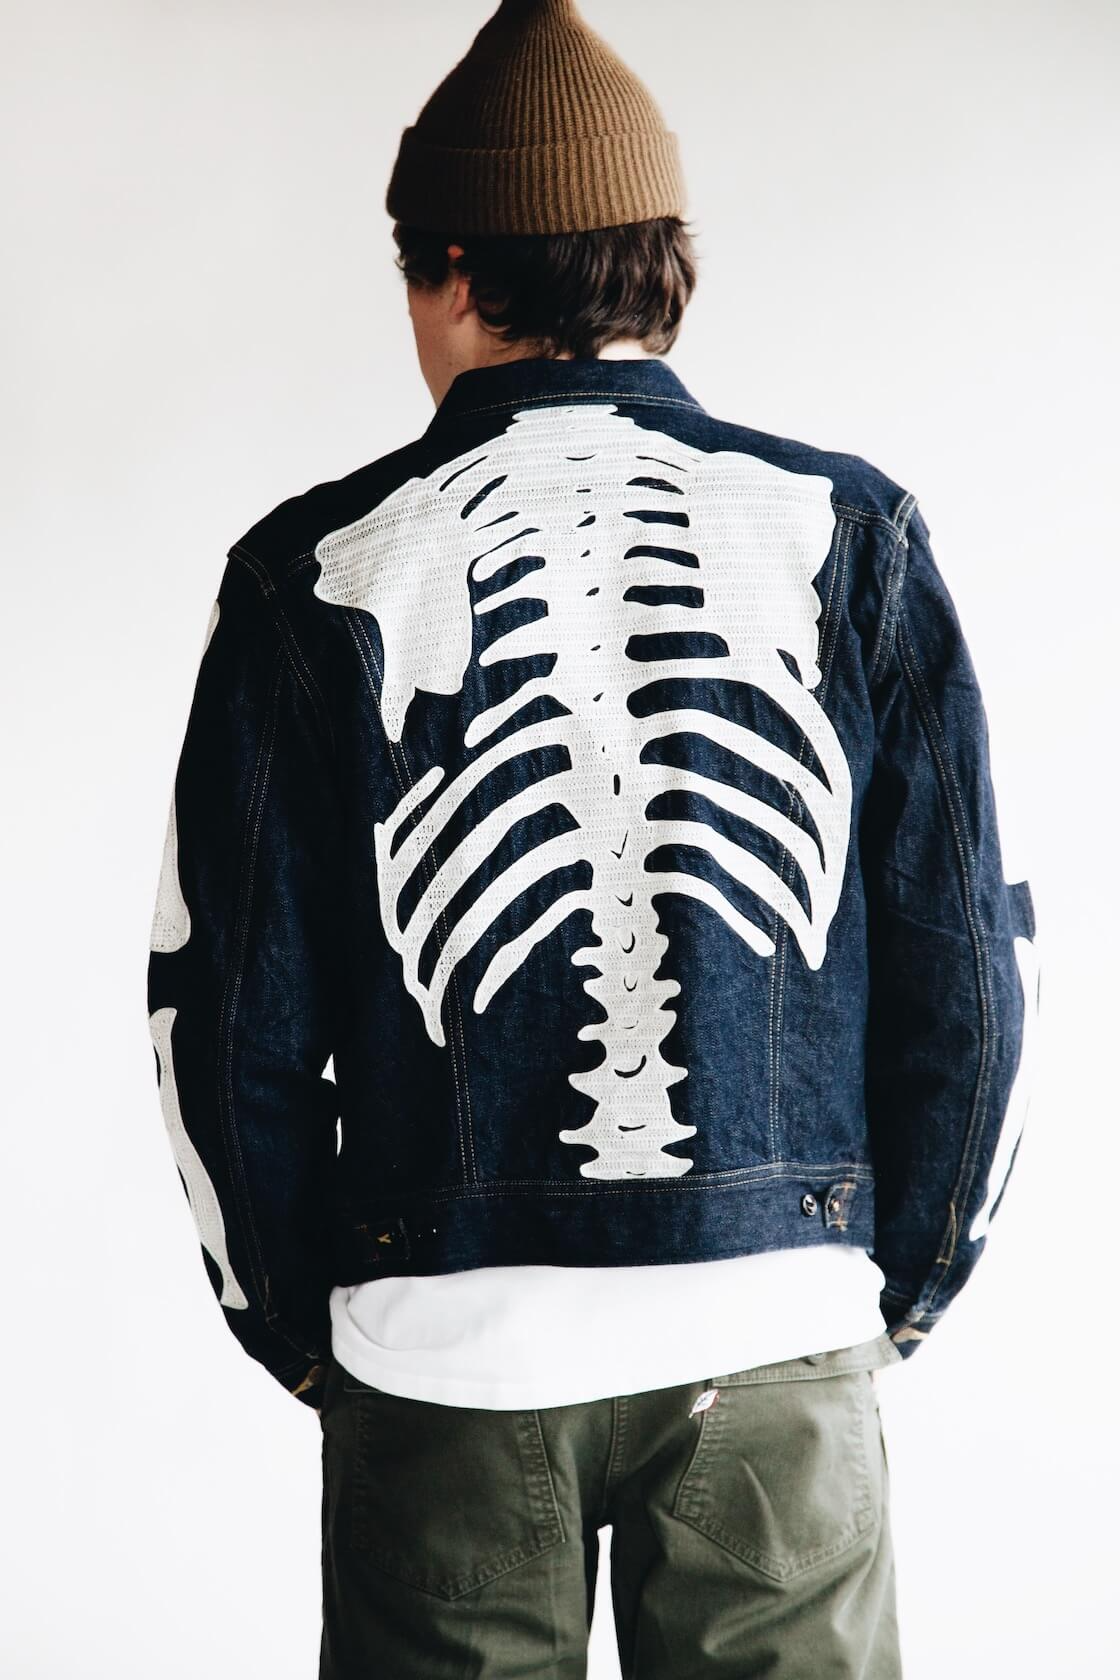 kapital bones denim jacket on body